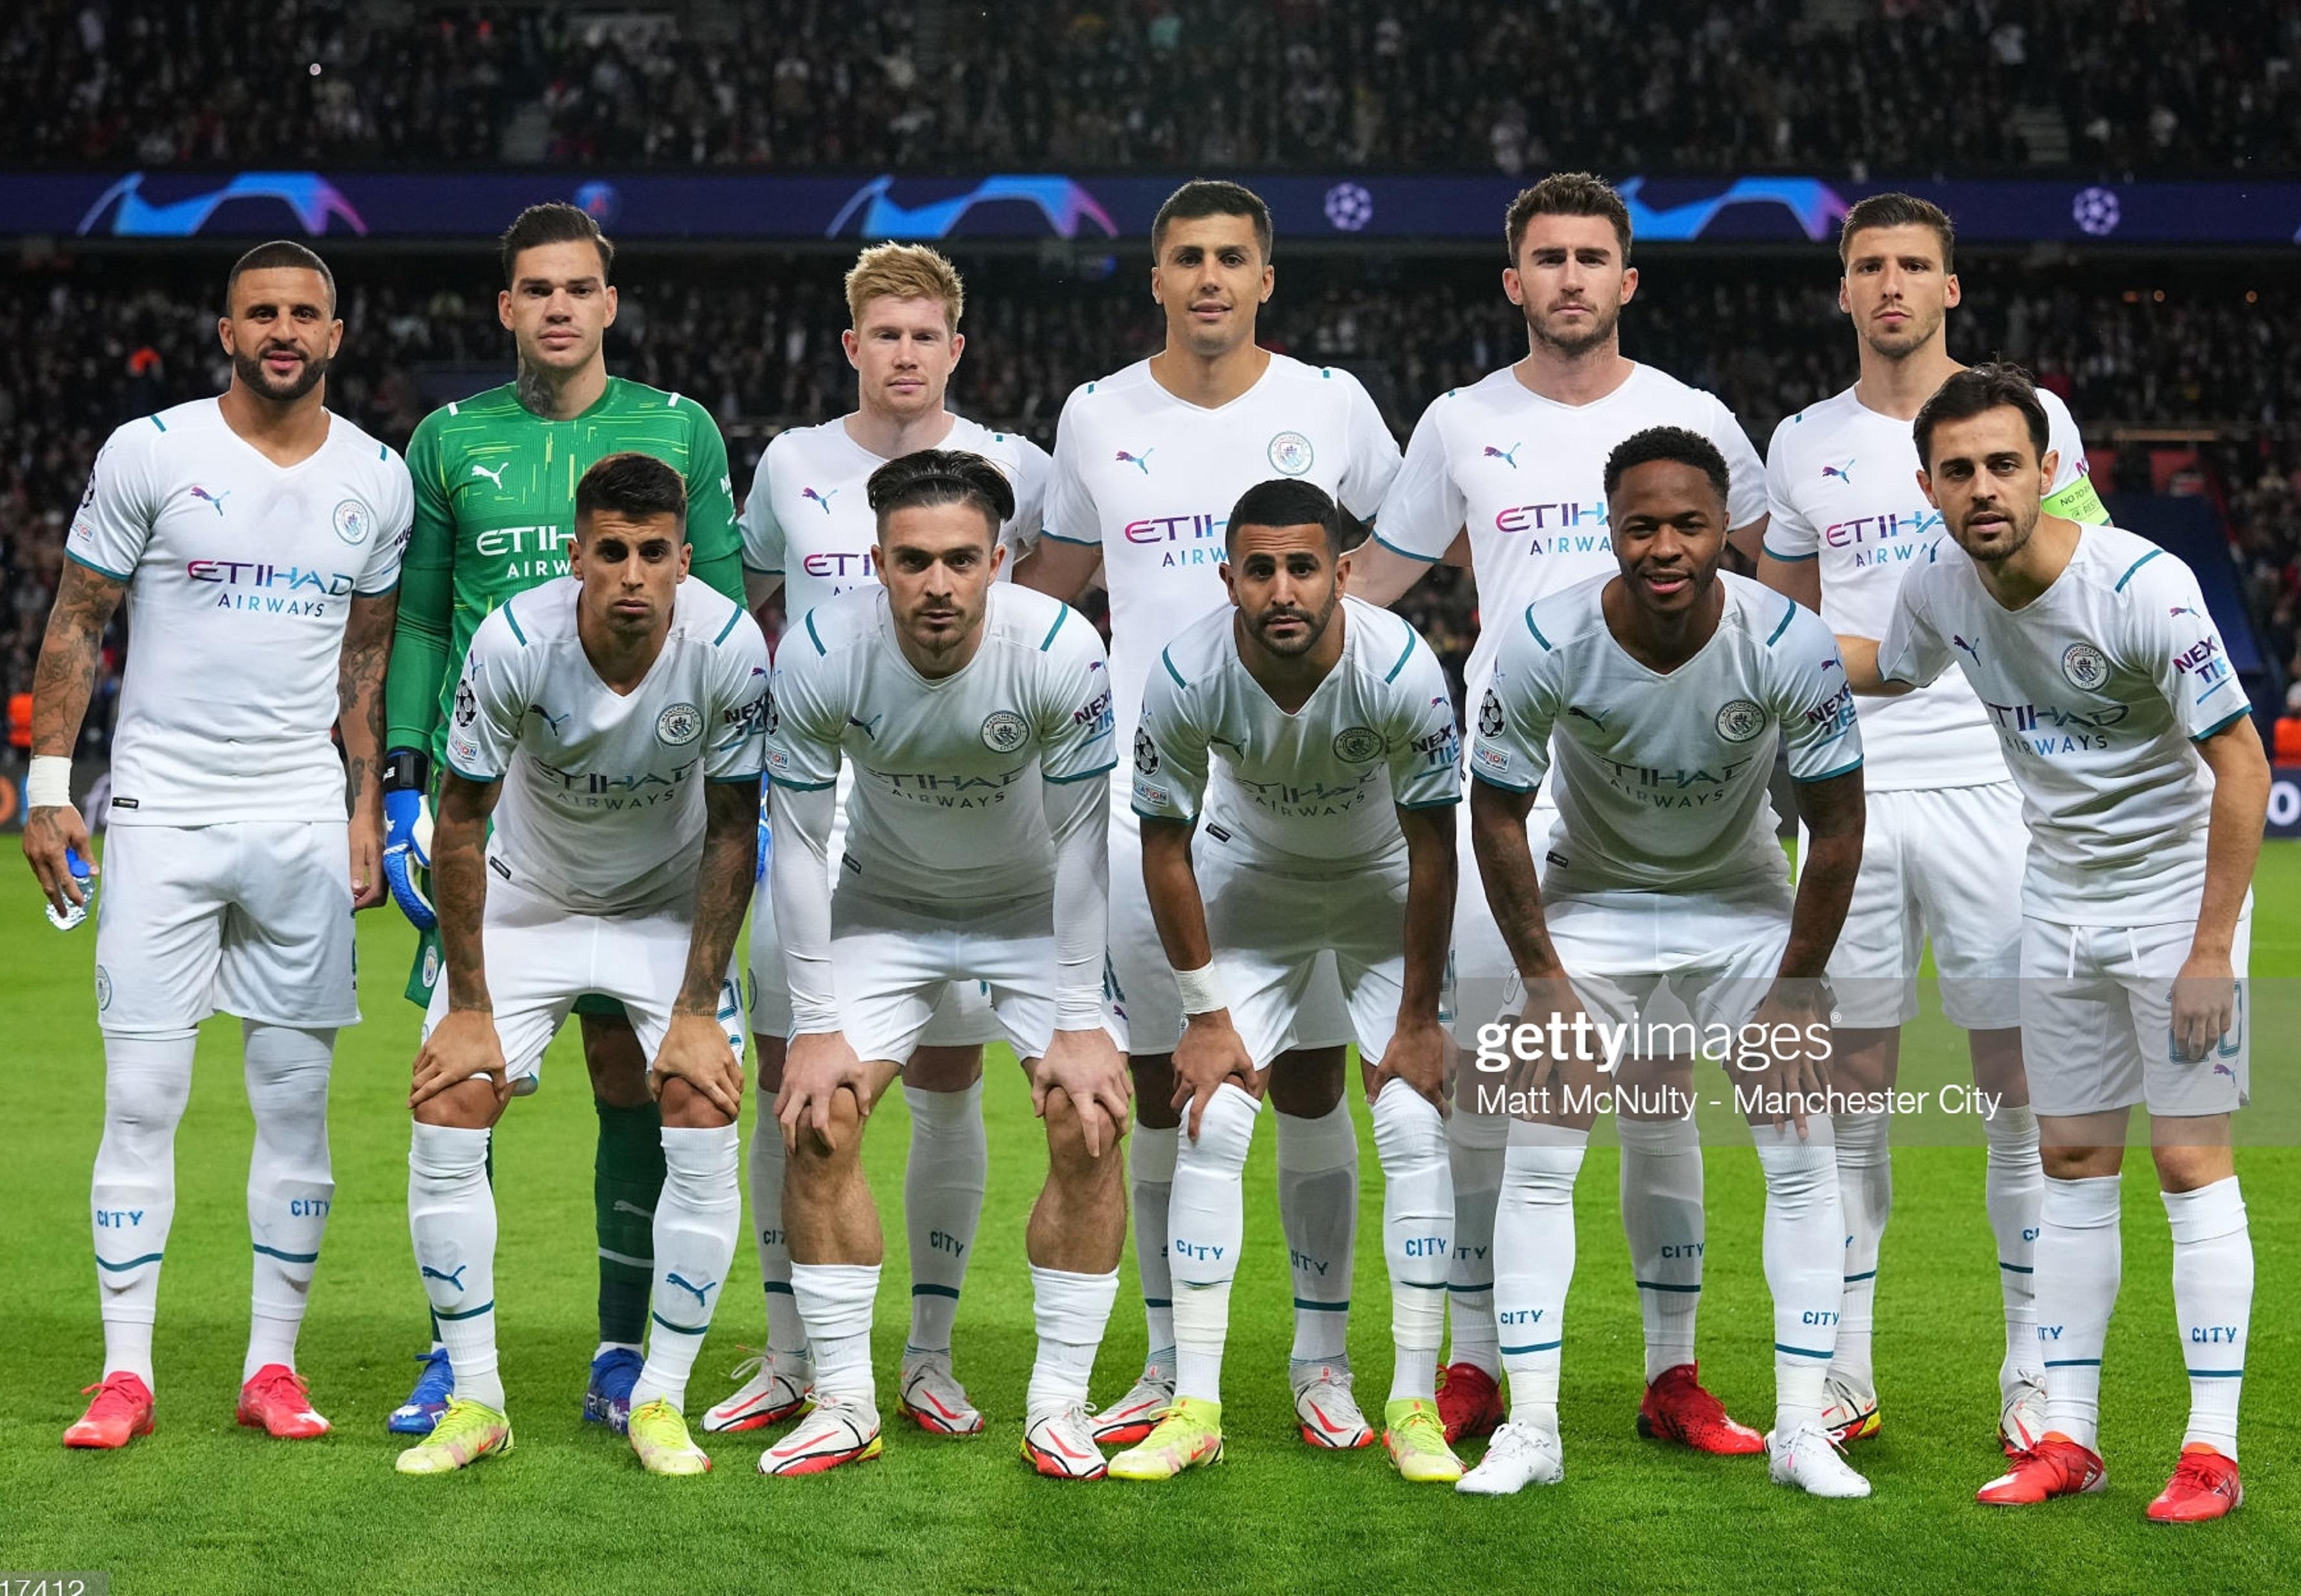 ПСЖ (Франция) - Манчестер Сити (Англия) 2:0